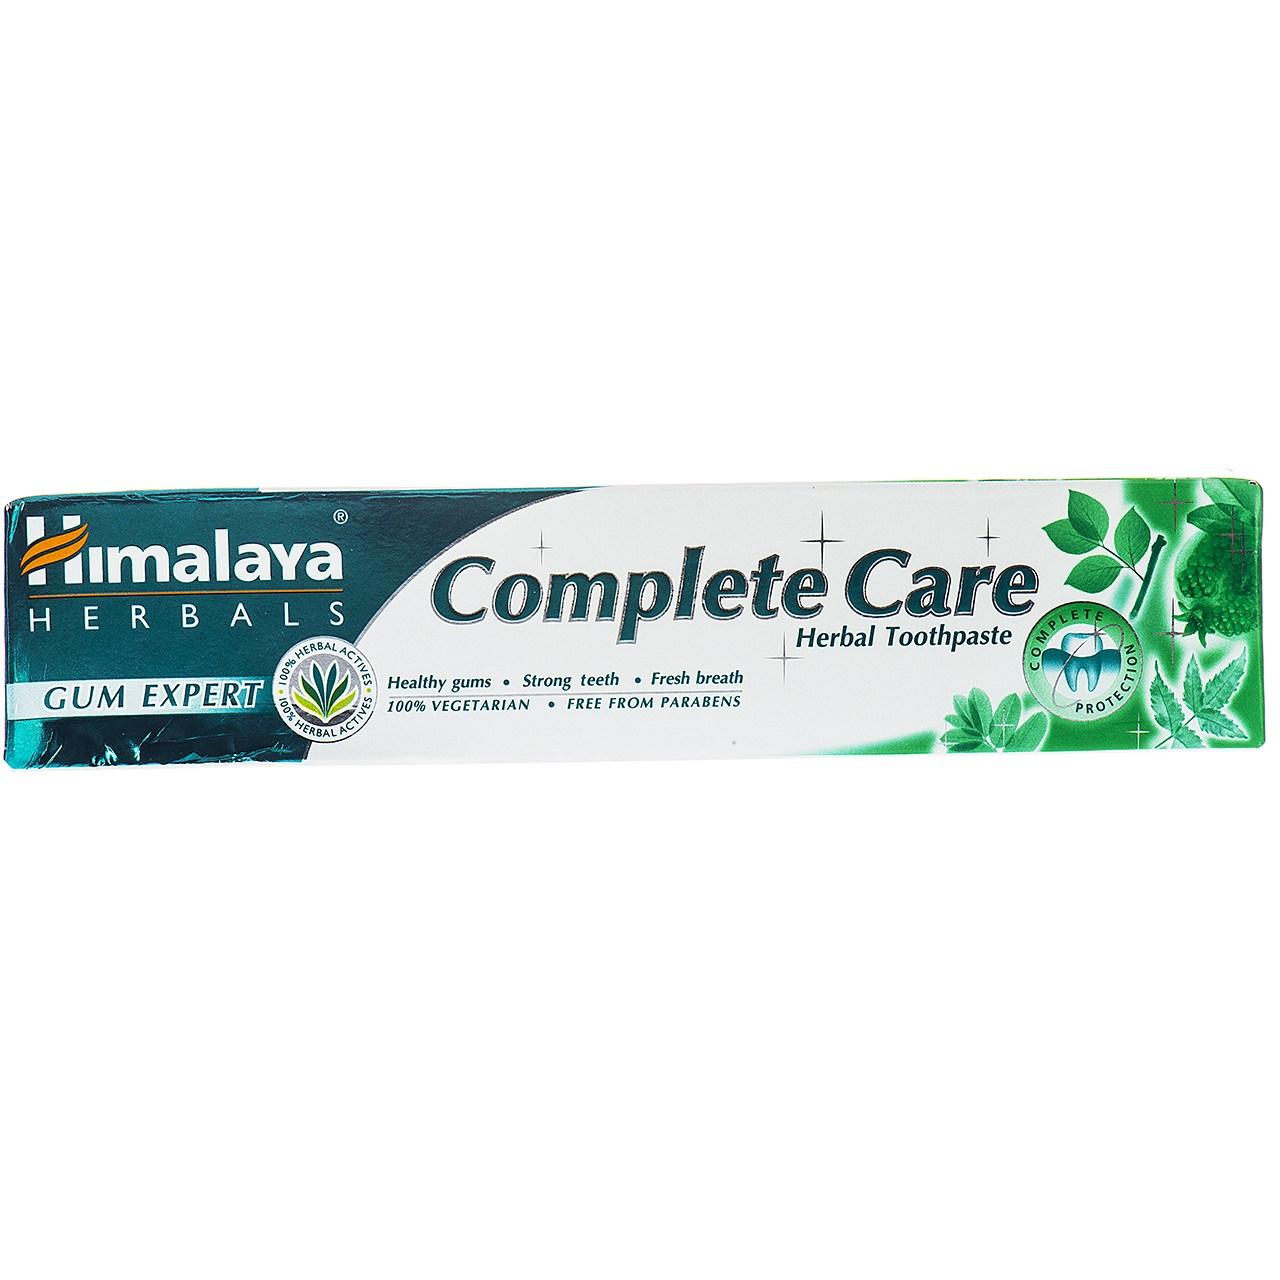 قیمت خمیر دندان گیاهی هیمالیا مدل  Complete Care حجم 75 میلی لیتر